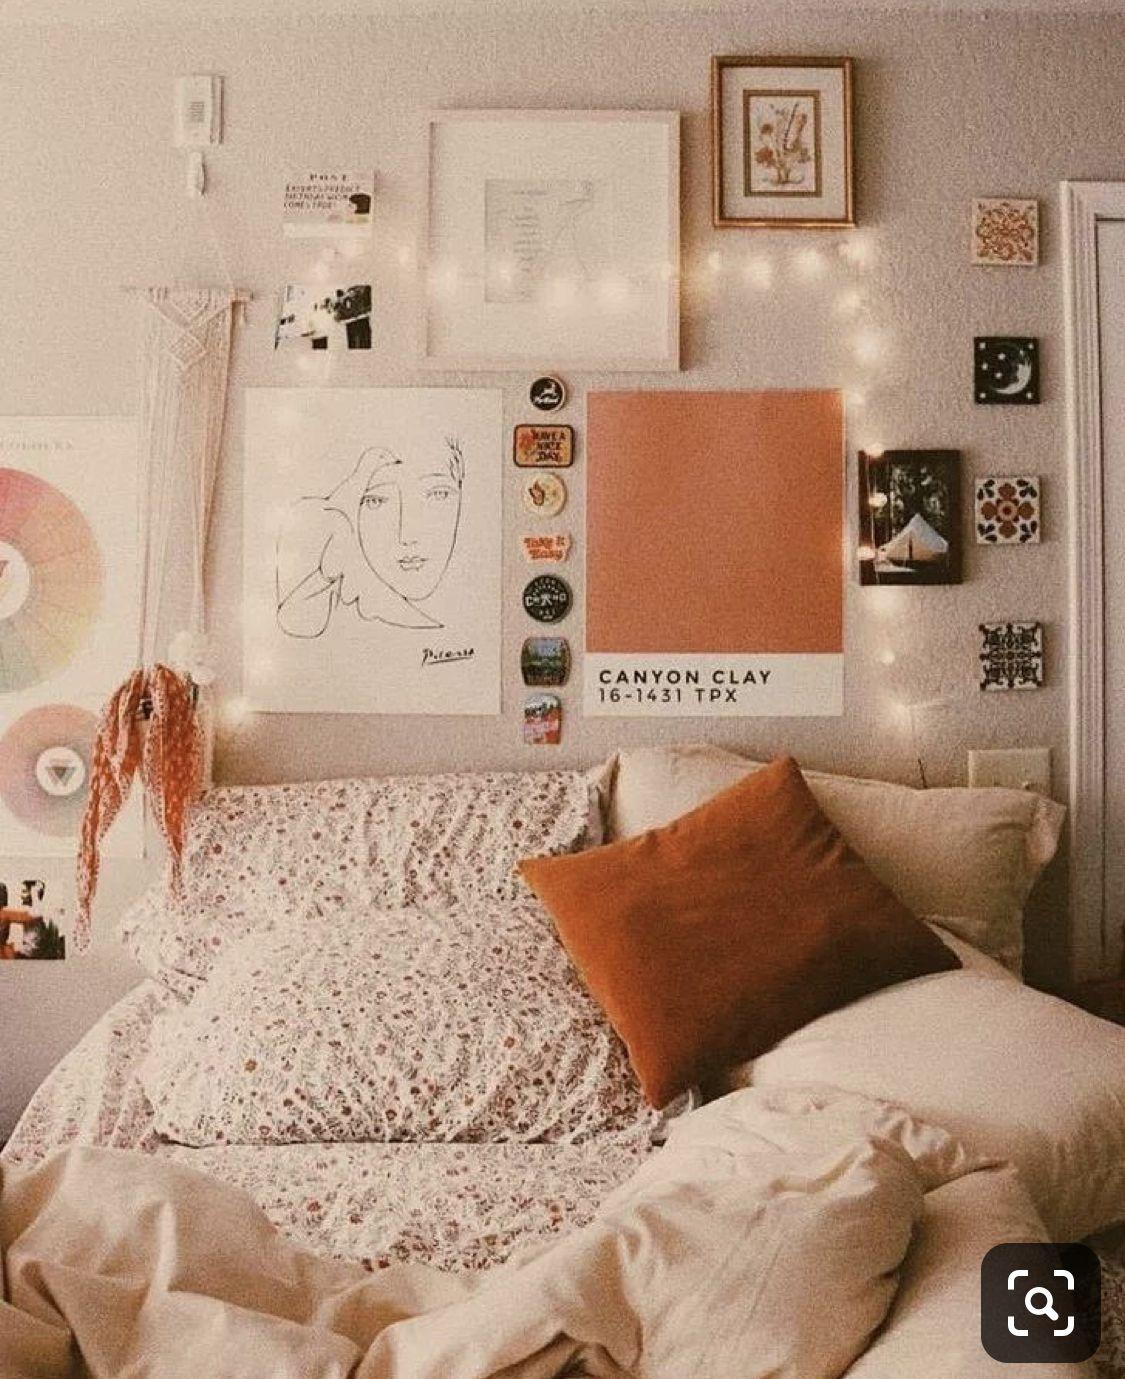 This Orange I Can T Dorm Room Decor Room Inspiration Dorm Room Inspiration